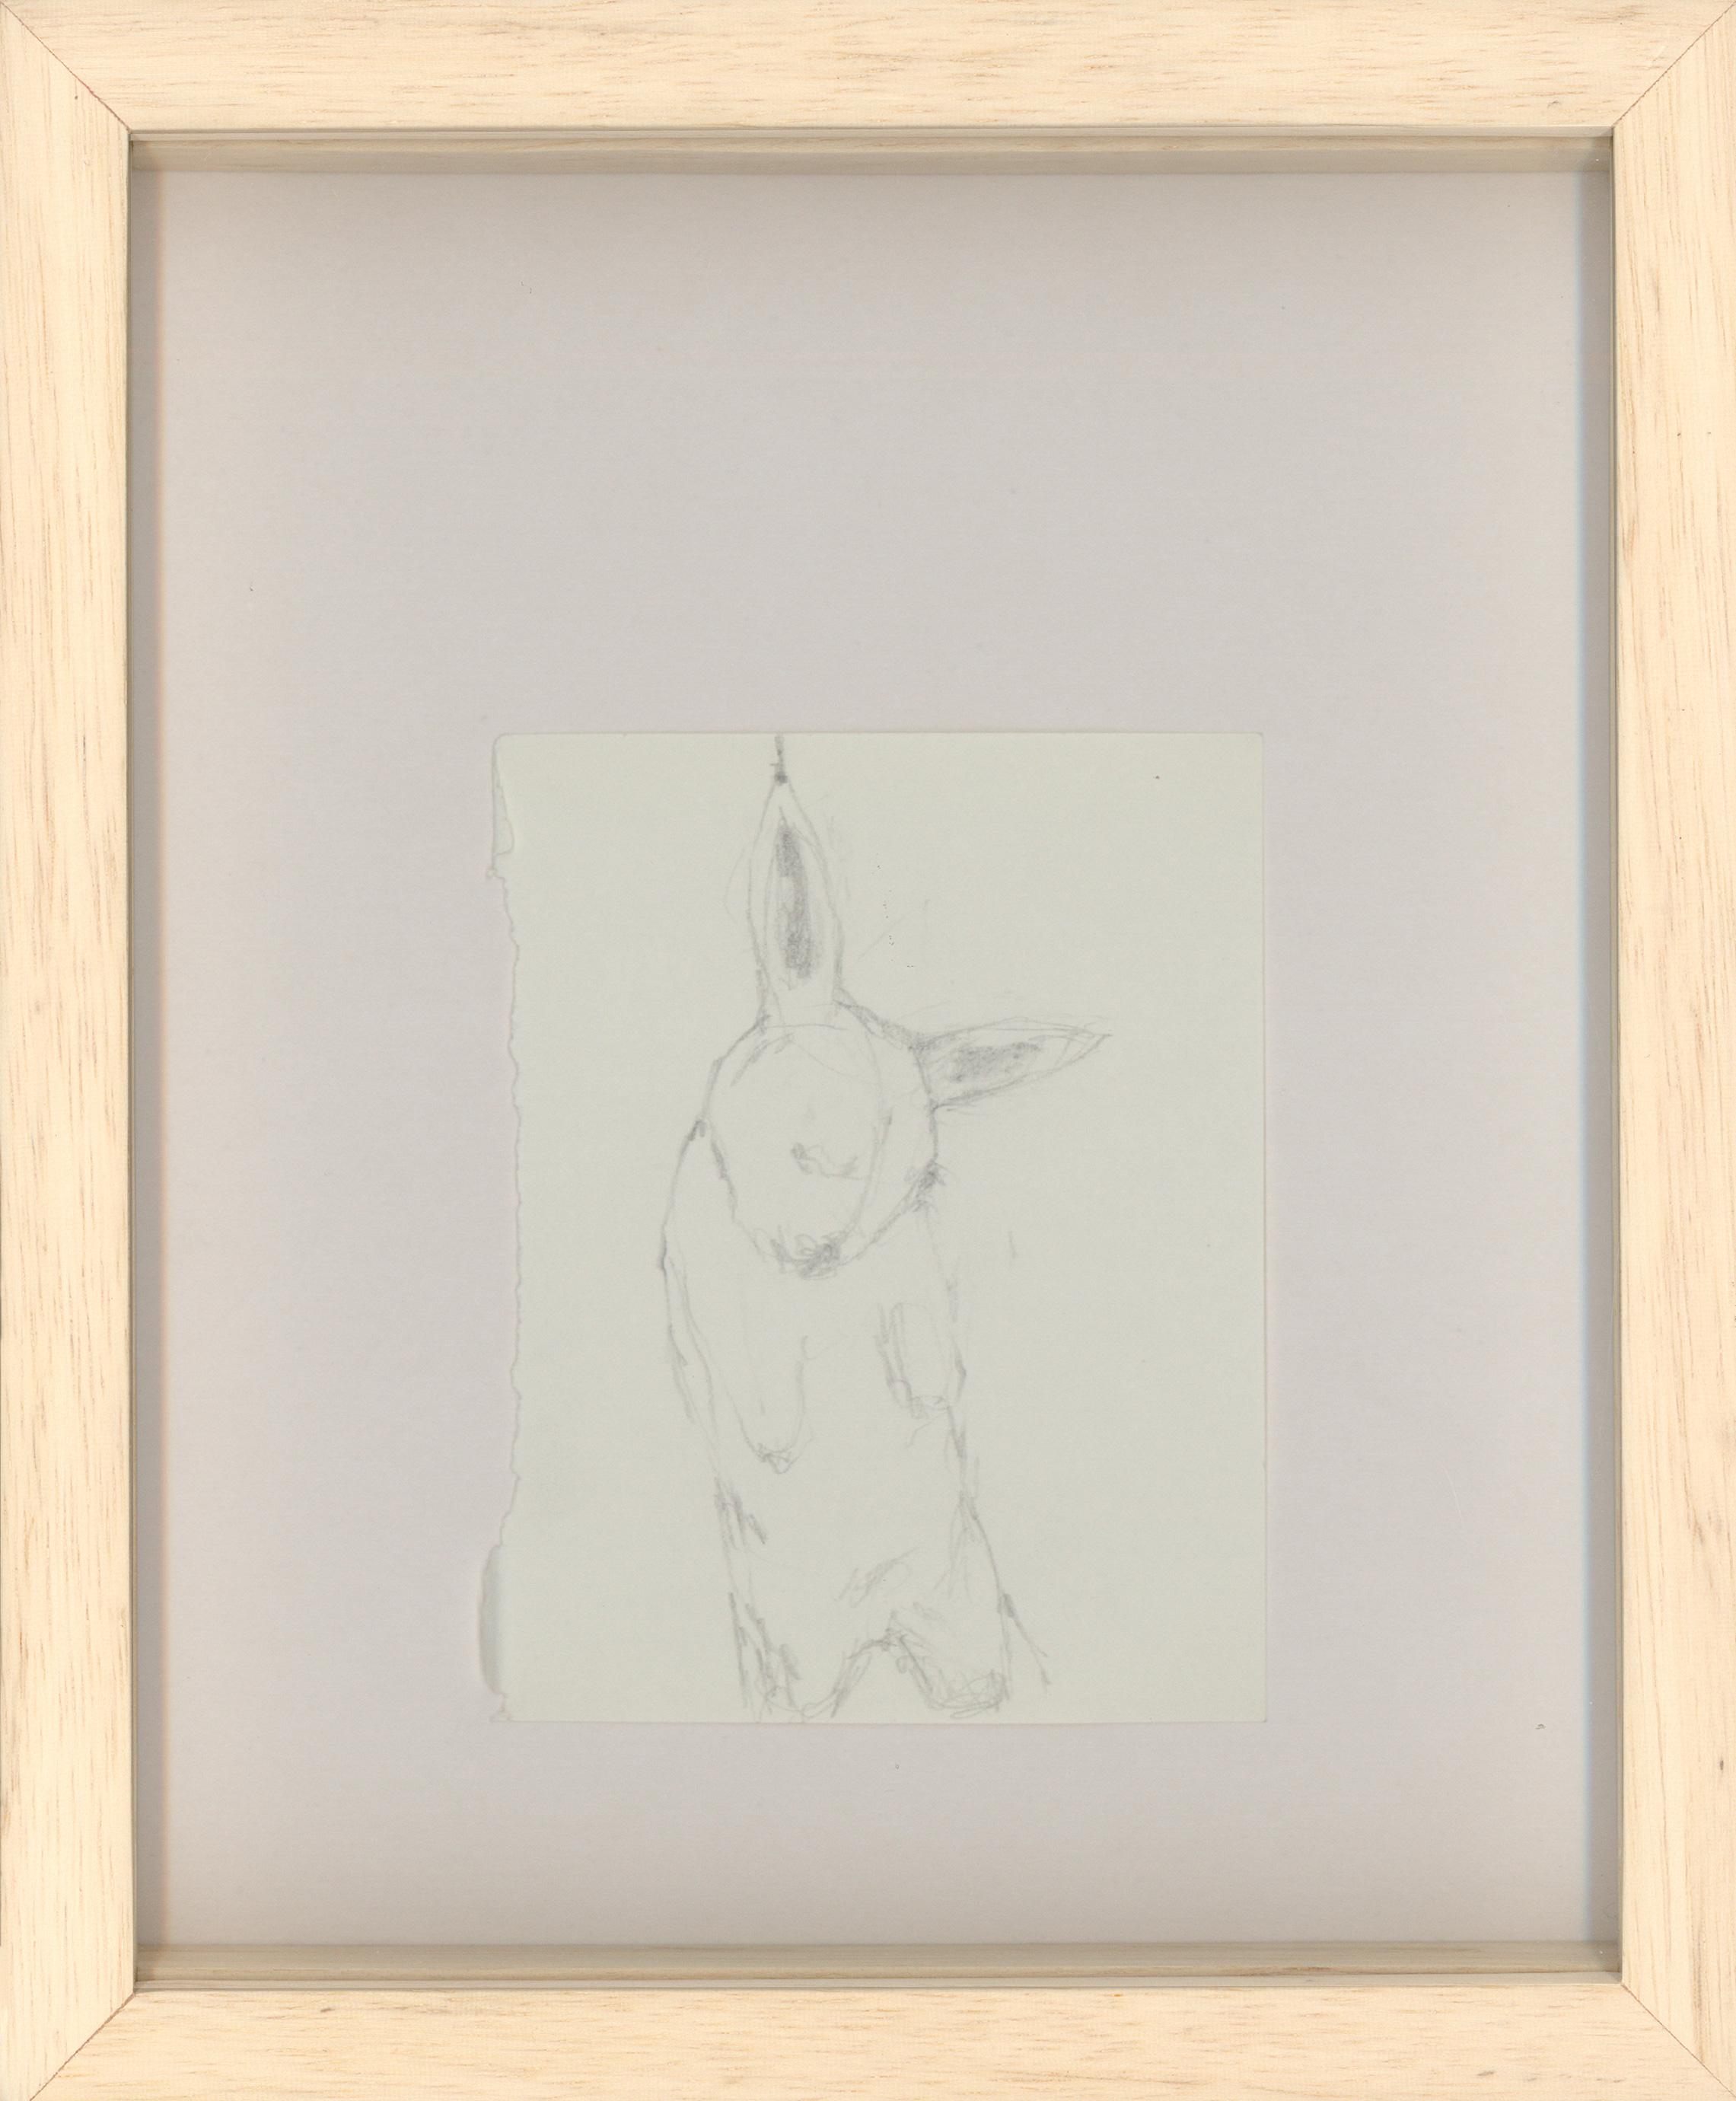 Galerie Barbara Thumm \ Maria José Arjona \ Untitled (2016)